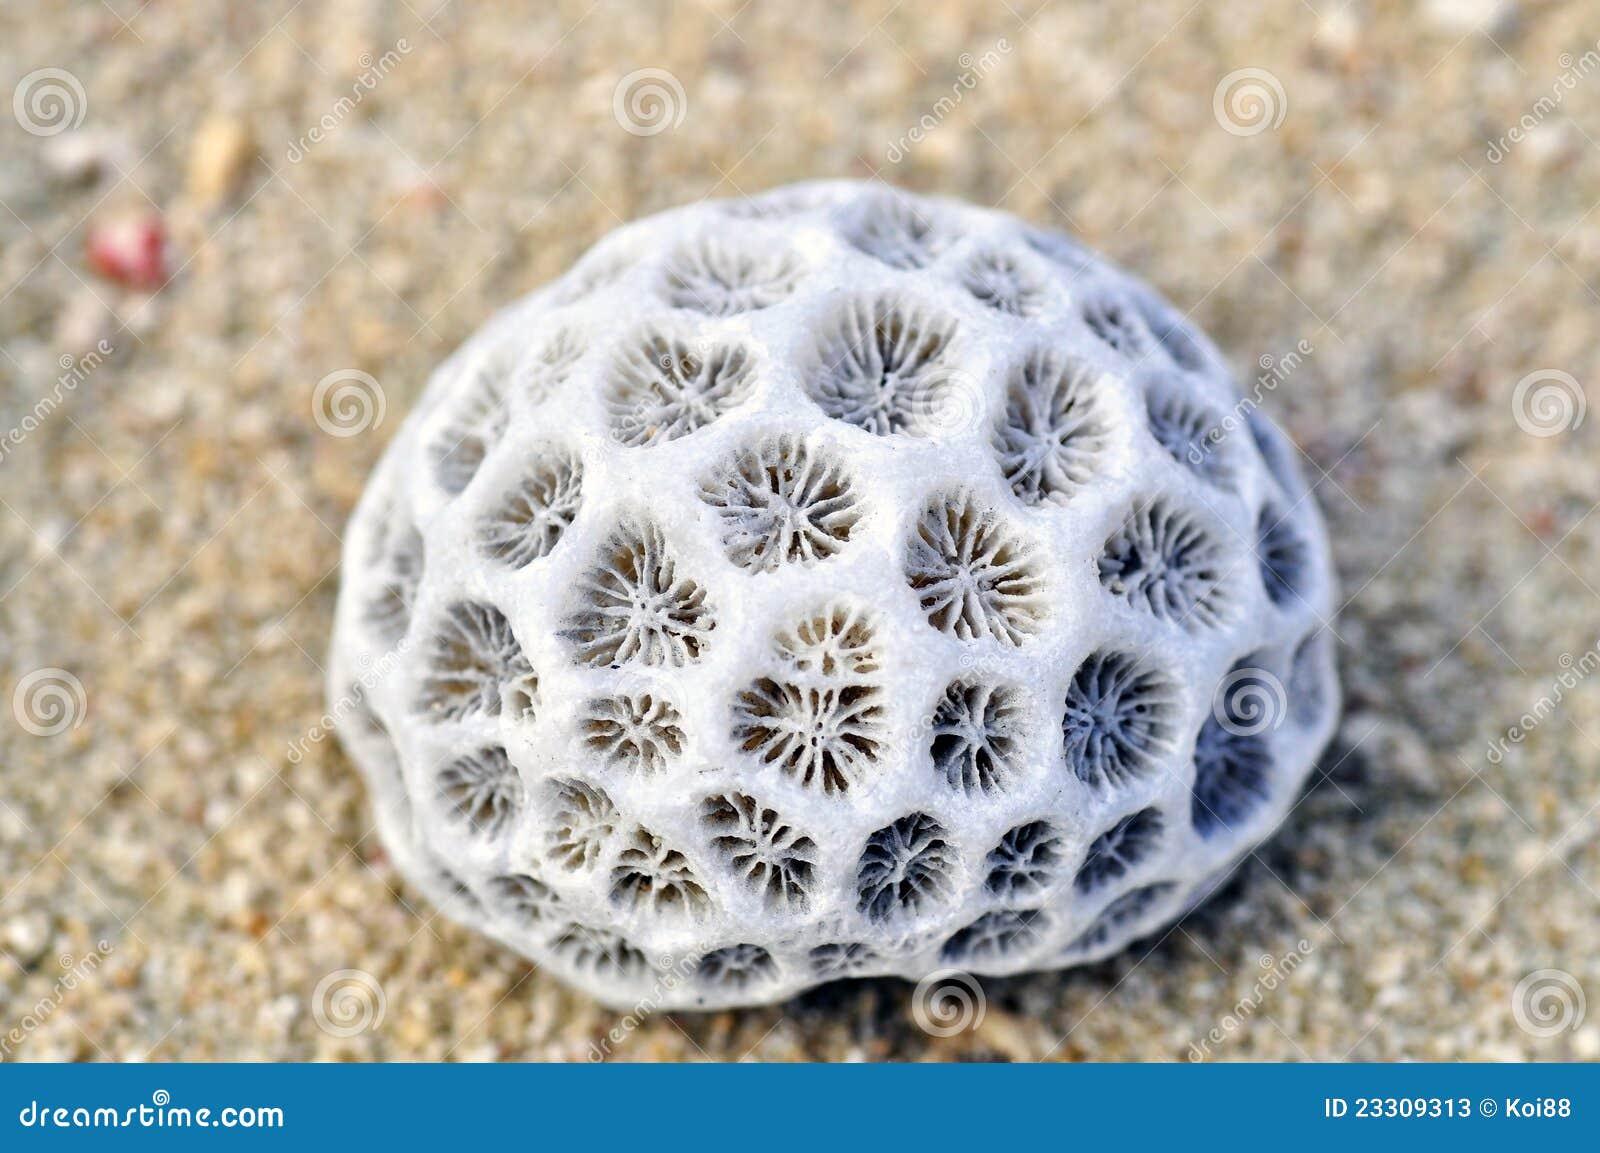 corals app